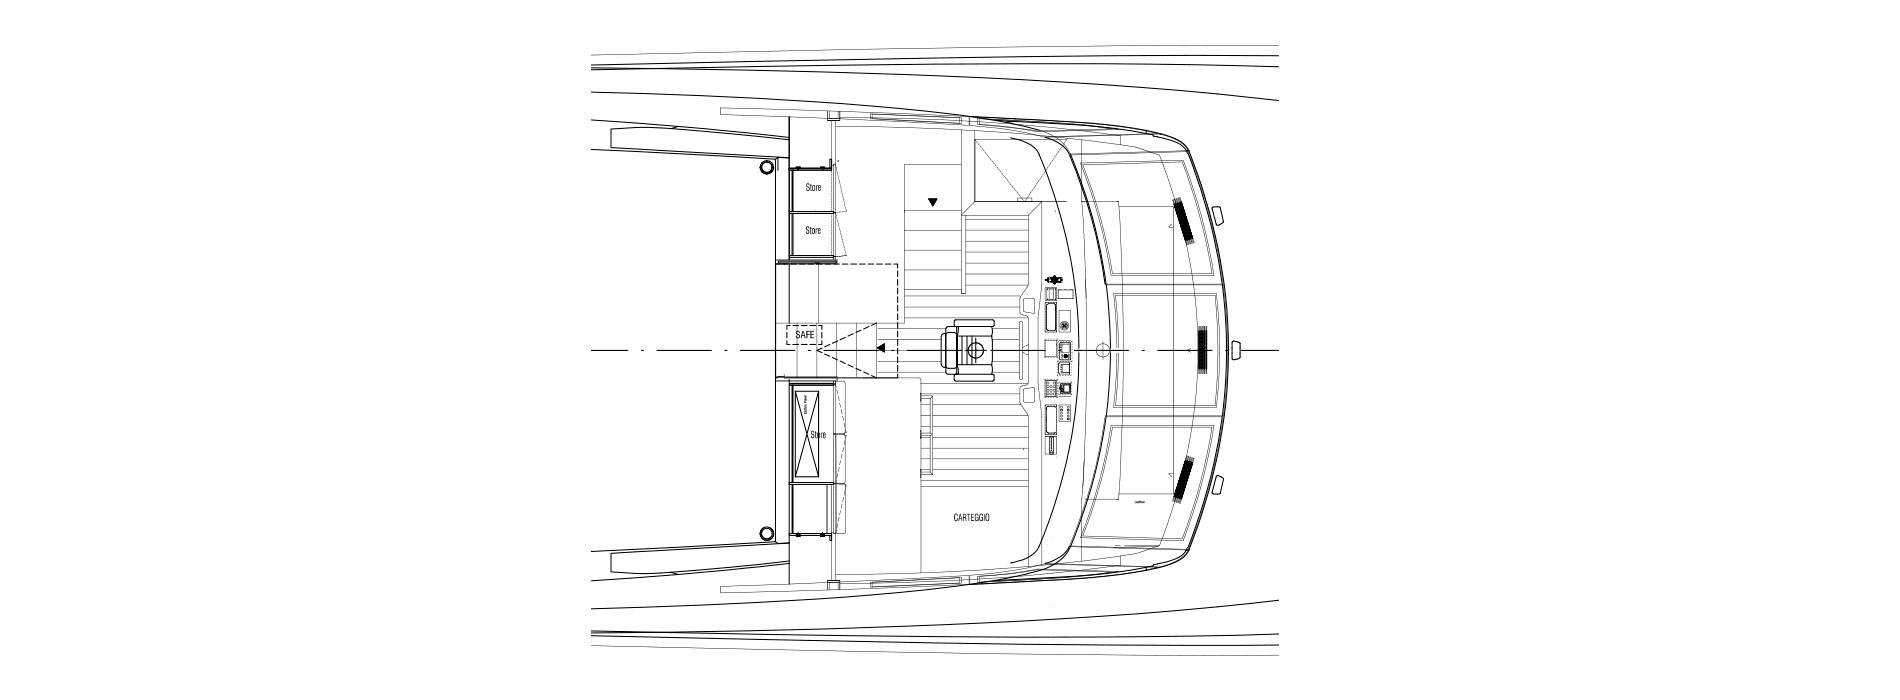 Sanlorenzo Yachts SL96-684 Dettagli